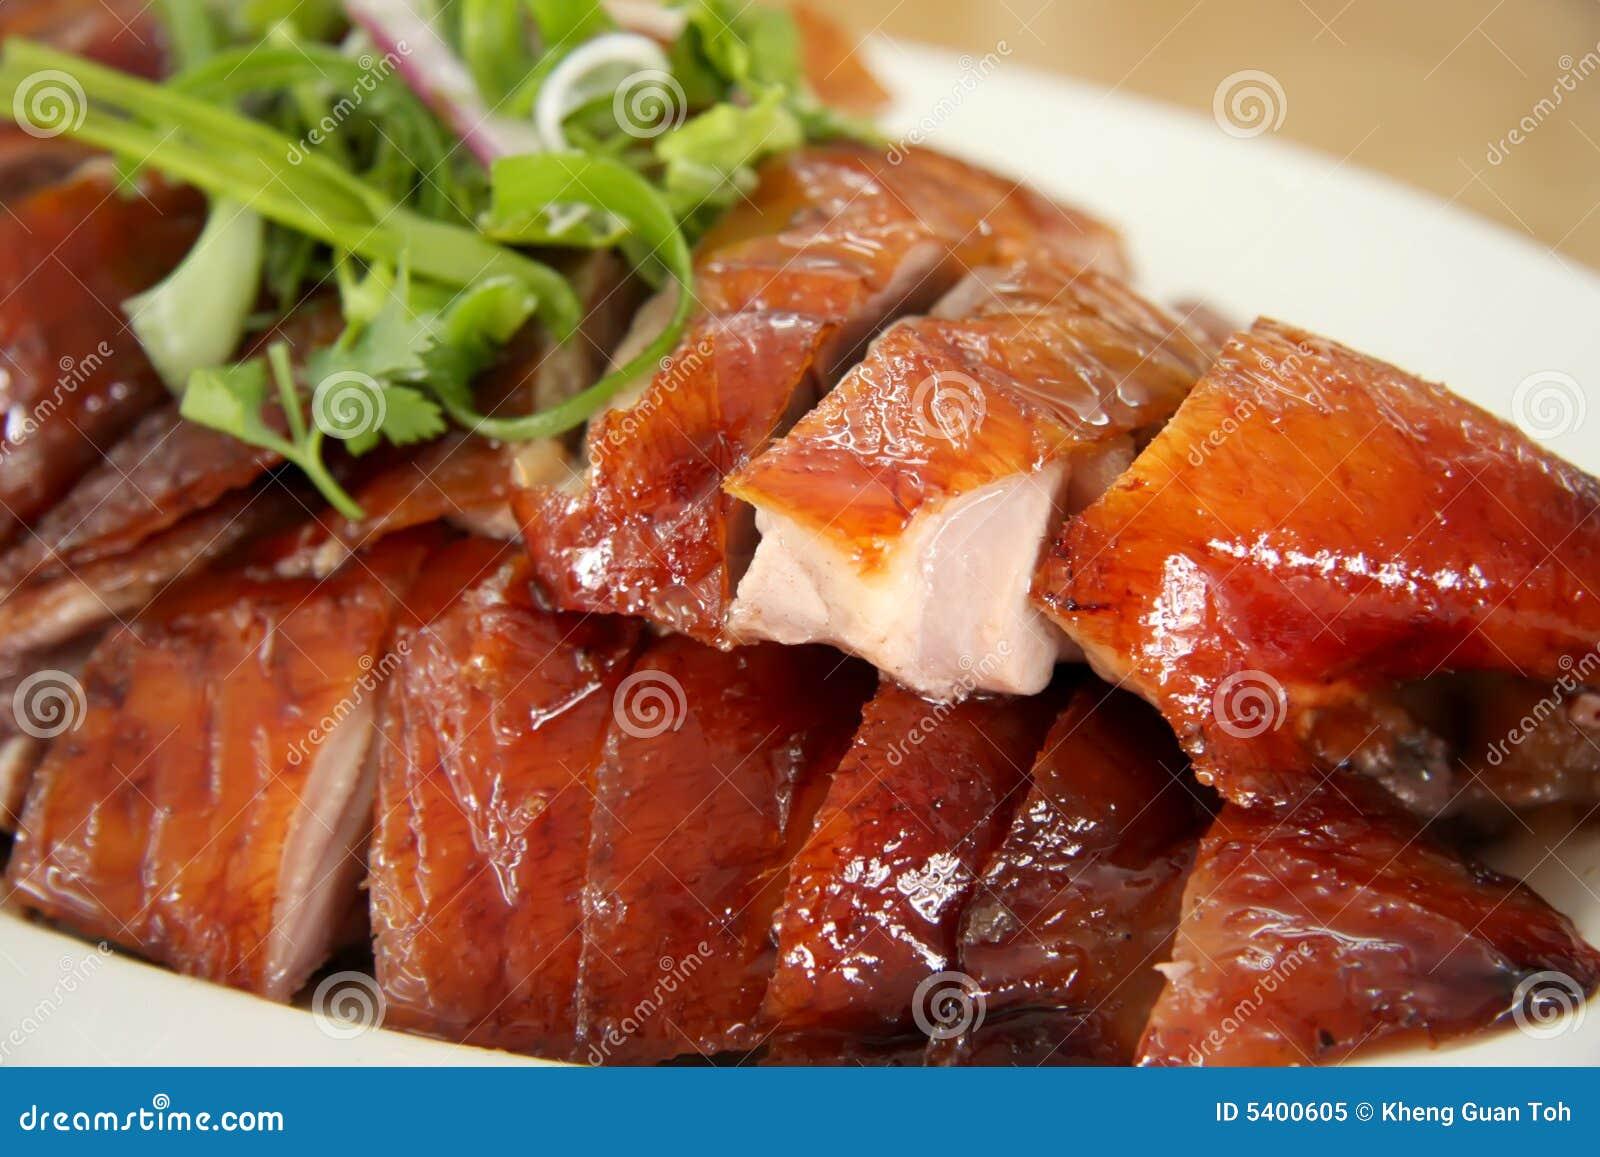 Roast duck slices